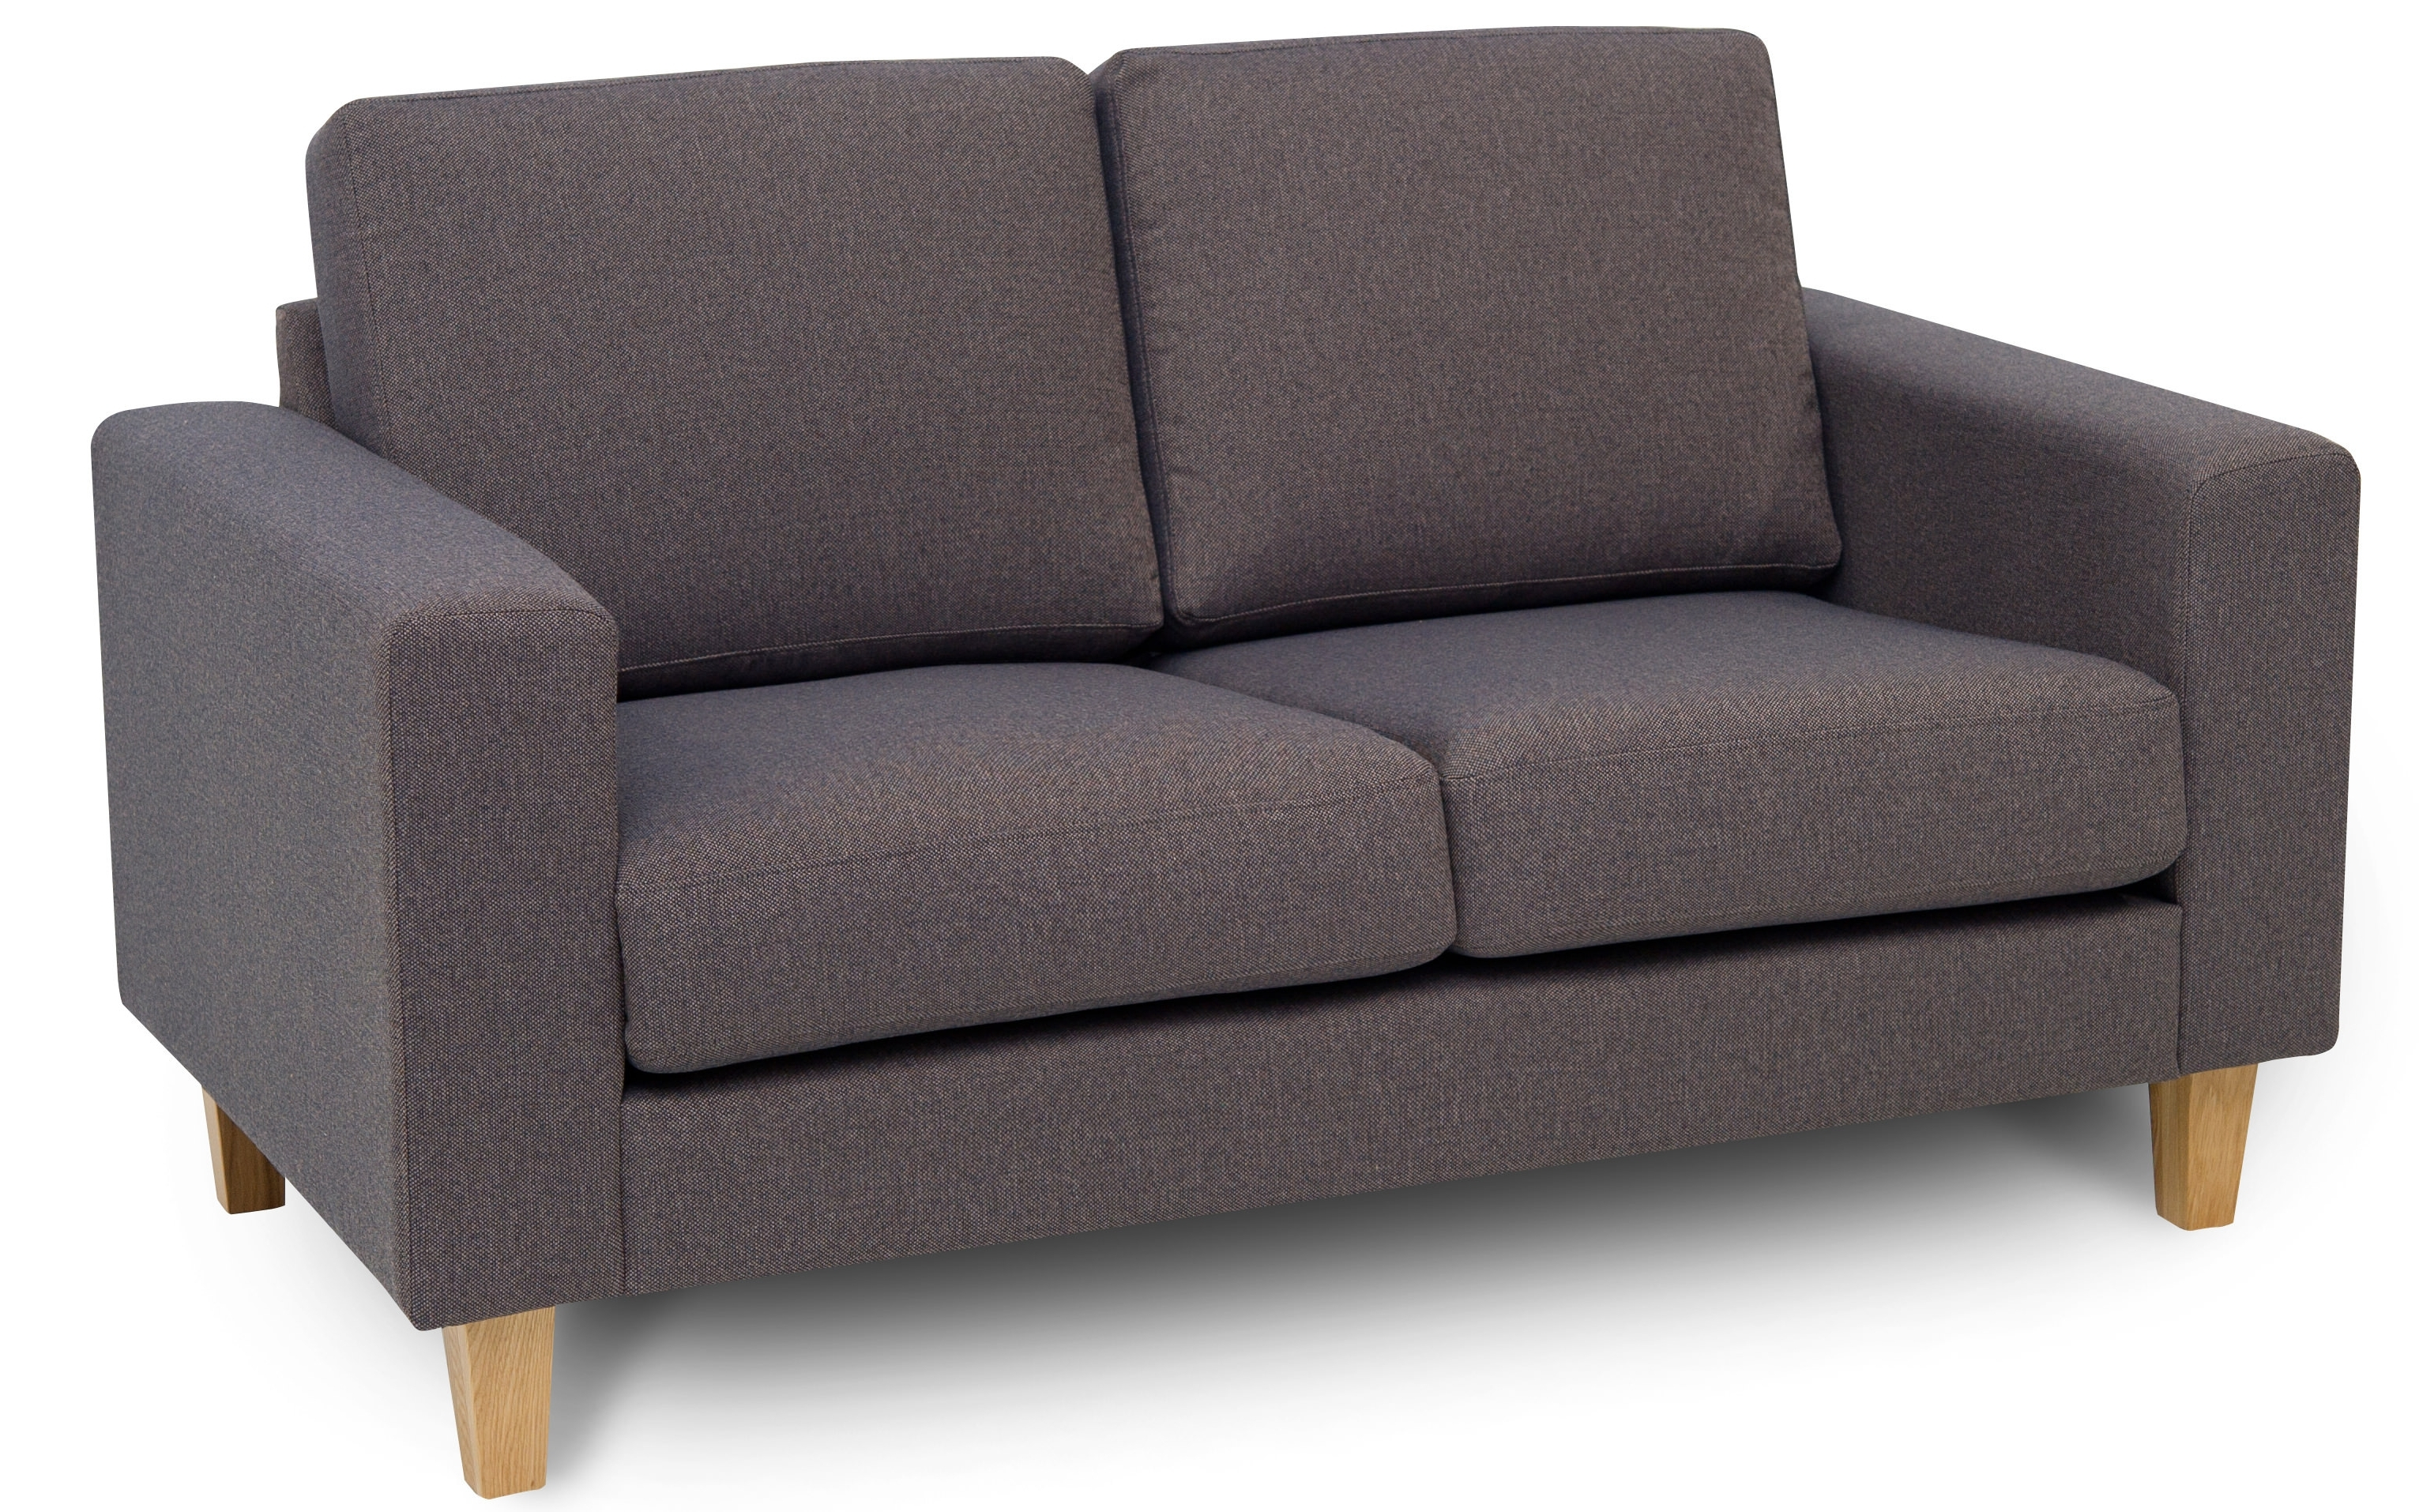 Designer Sofas (View 4 of 20)